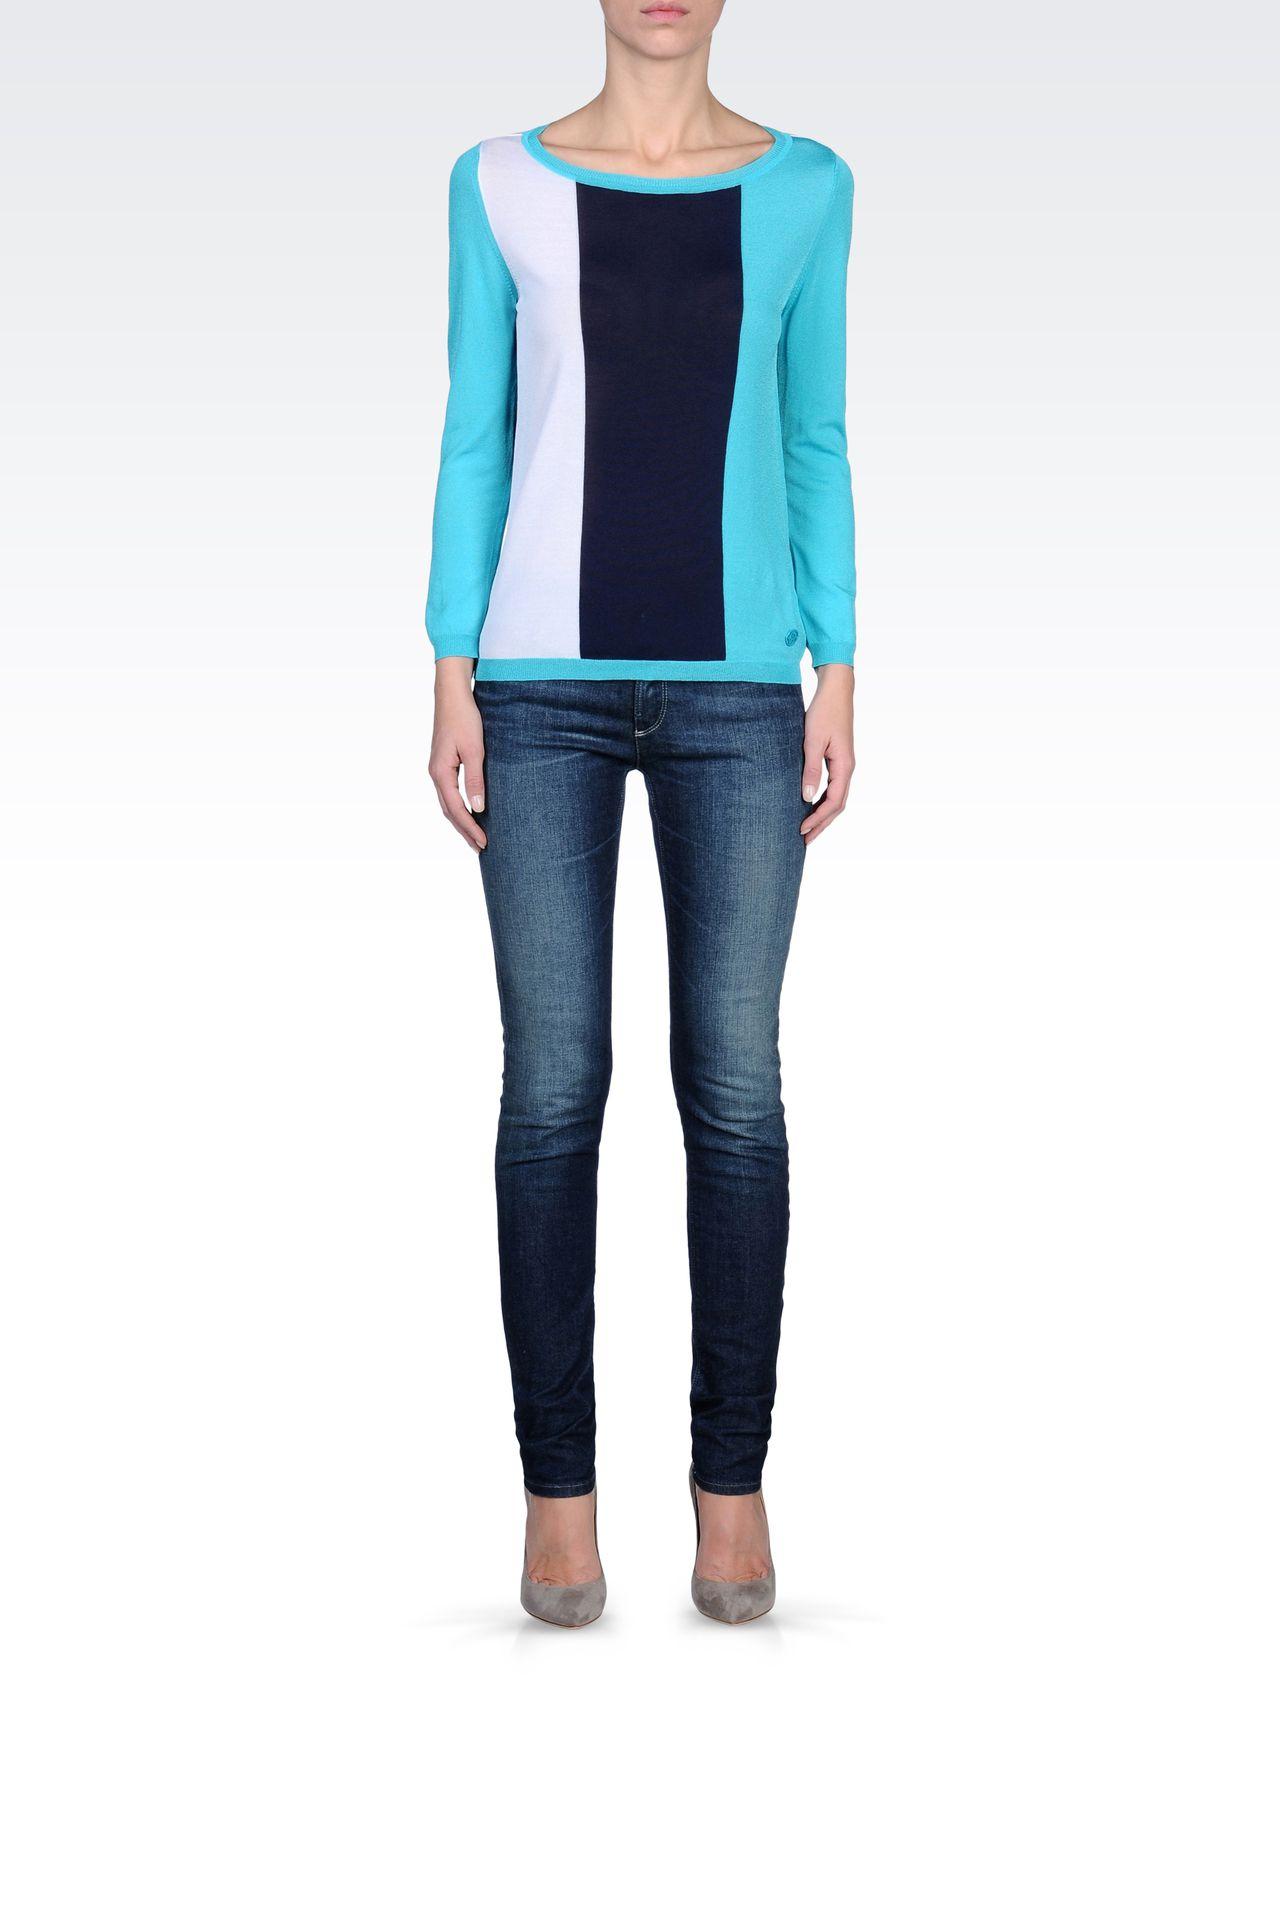 STRIPED SWEATER IN TECHNICAL VISCOSE: Crewneck sweaters Women by Armani - 0